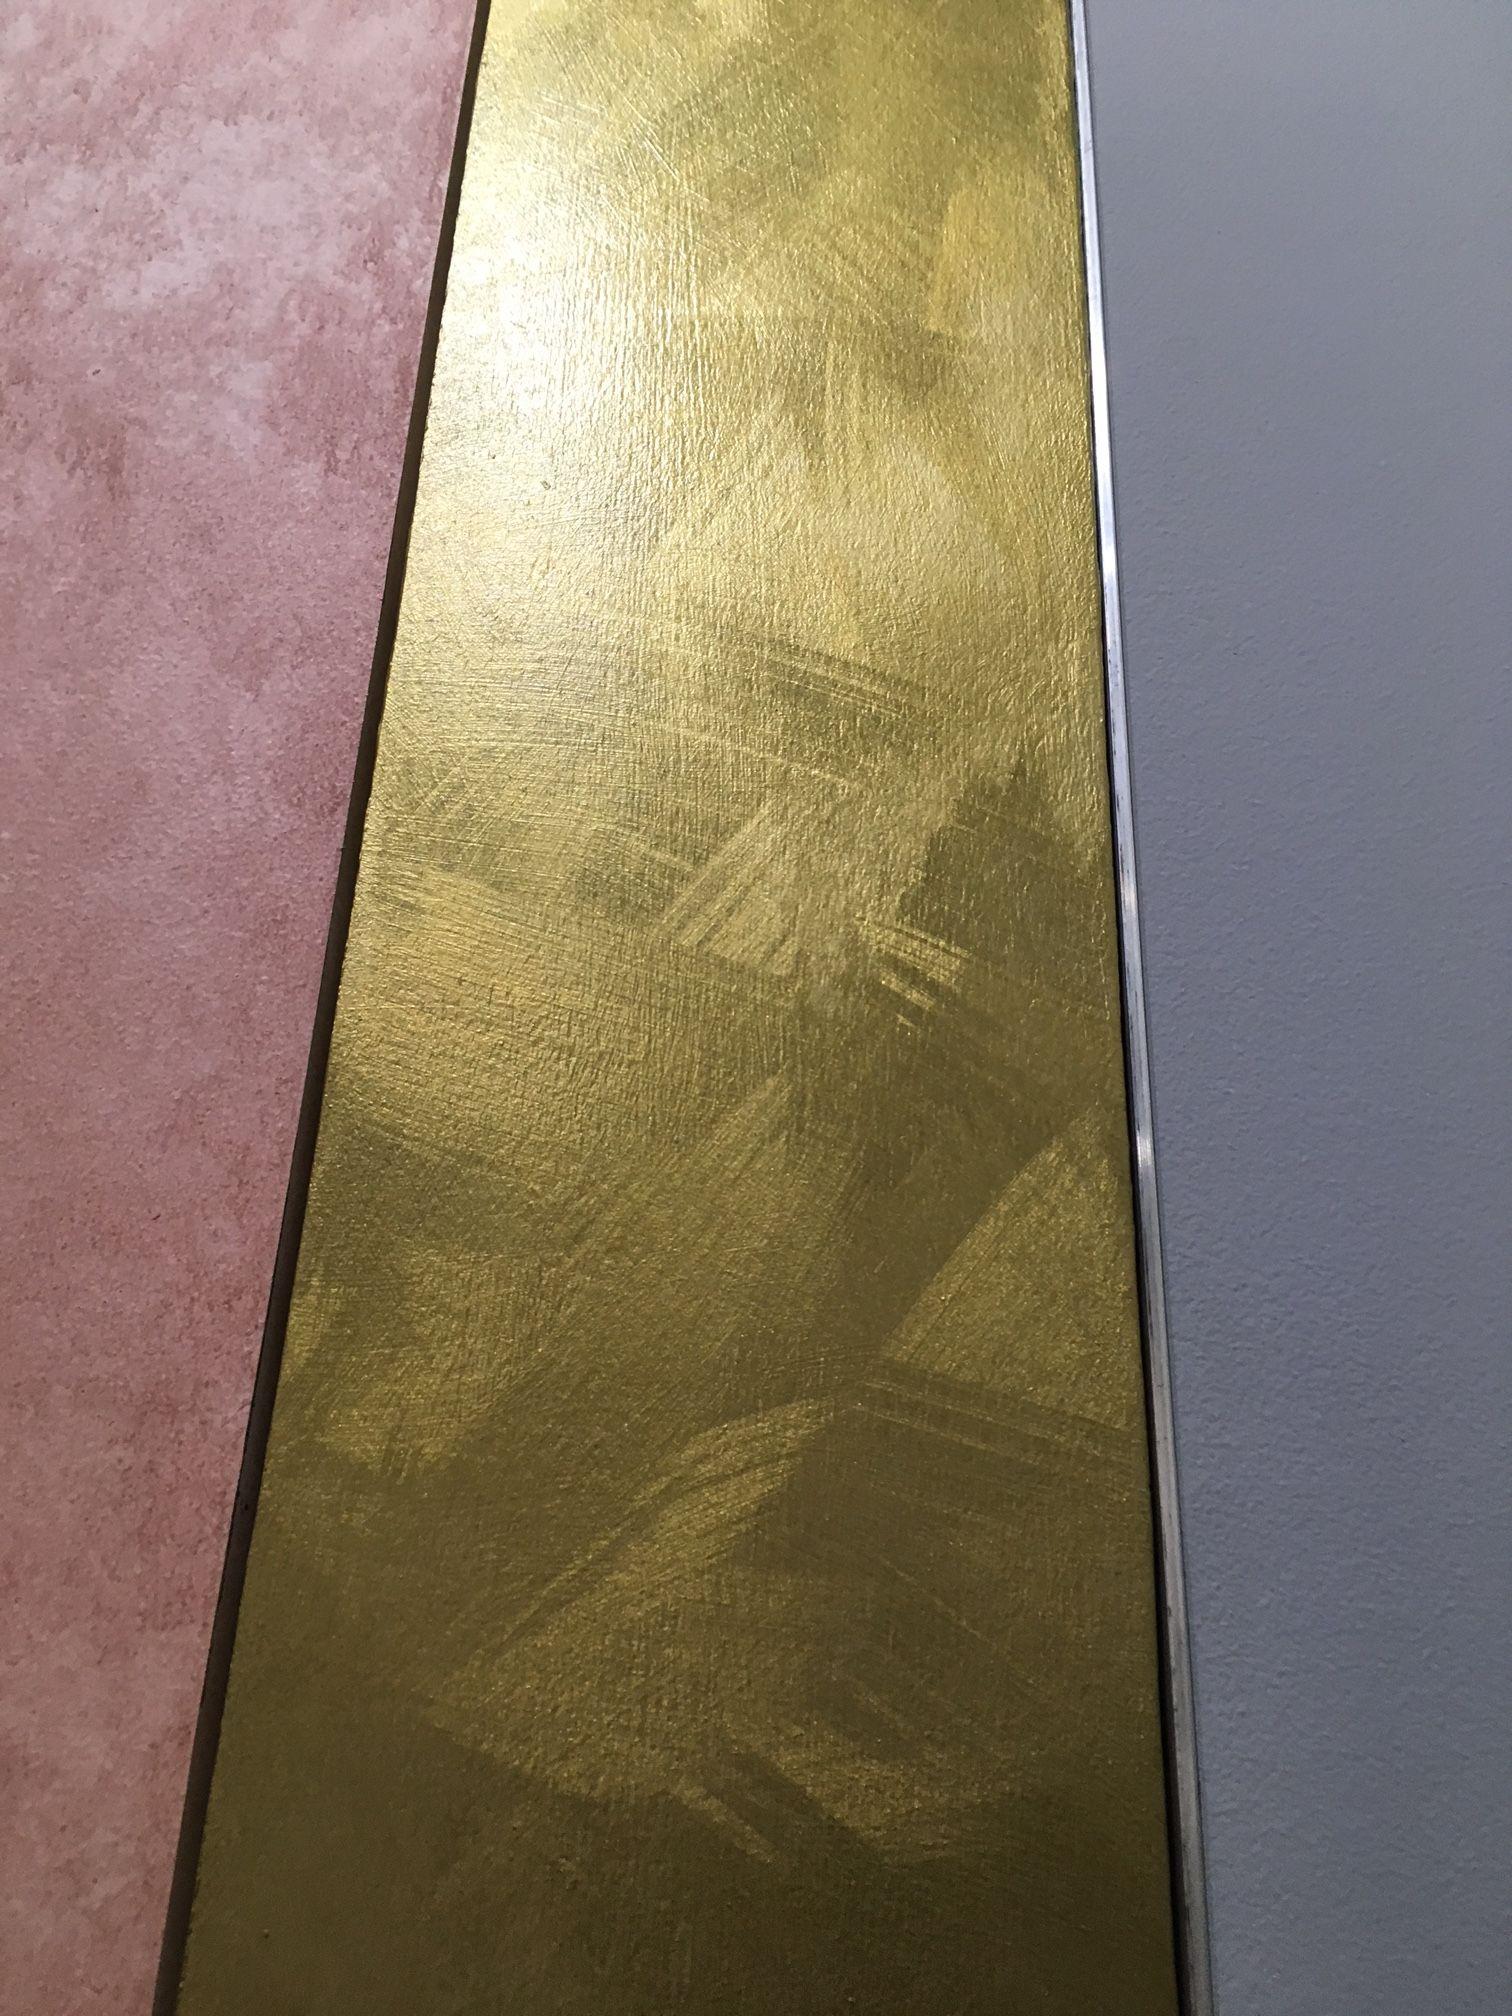 Liquid Gold Liquid Gold Gold Paint Metallic Paint